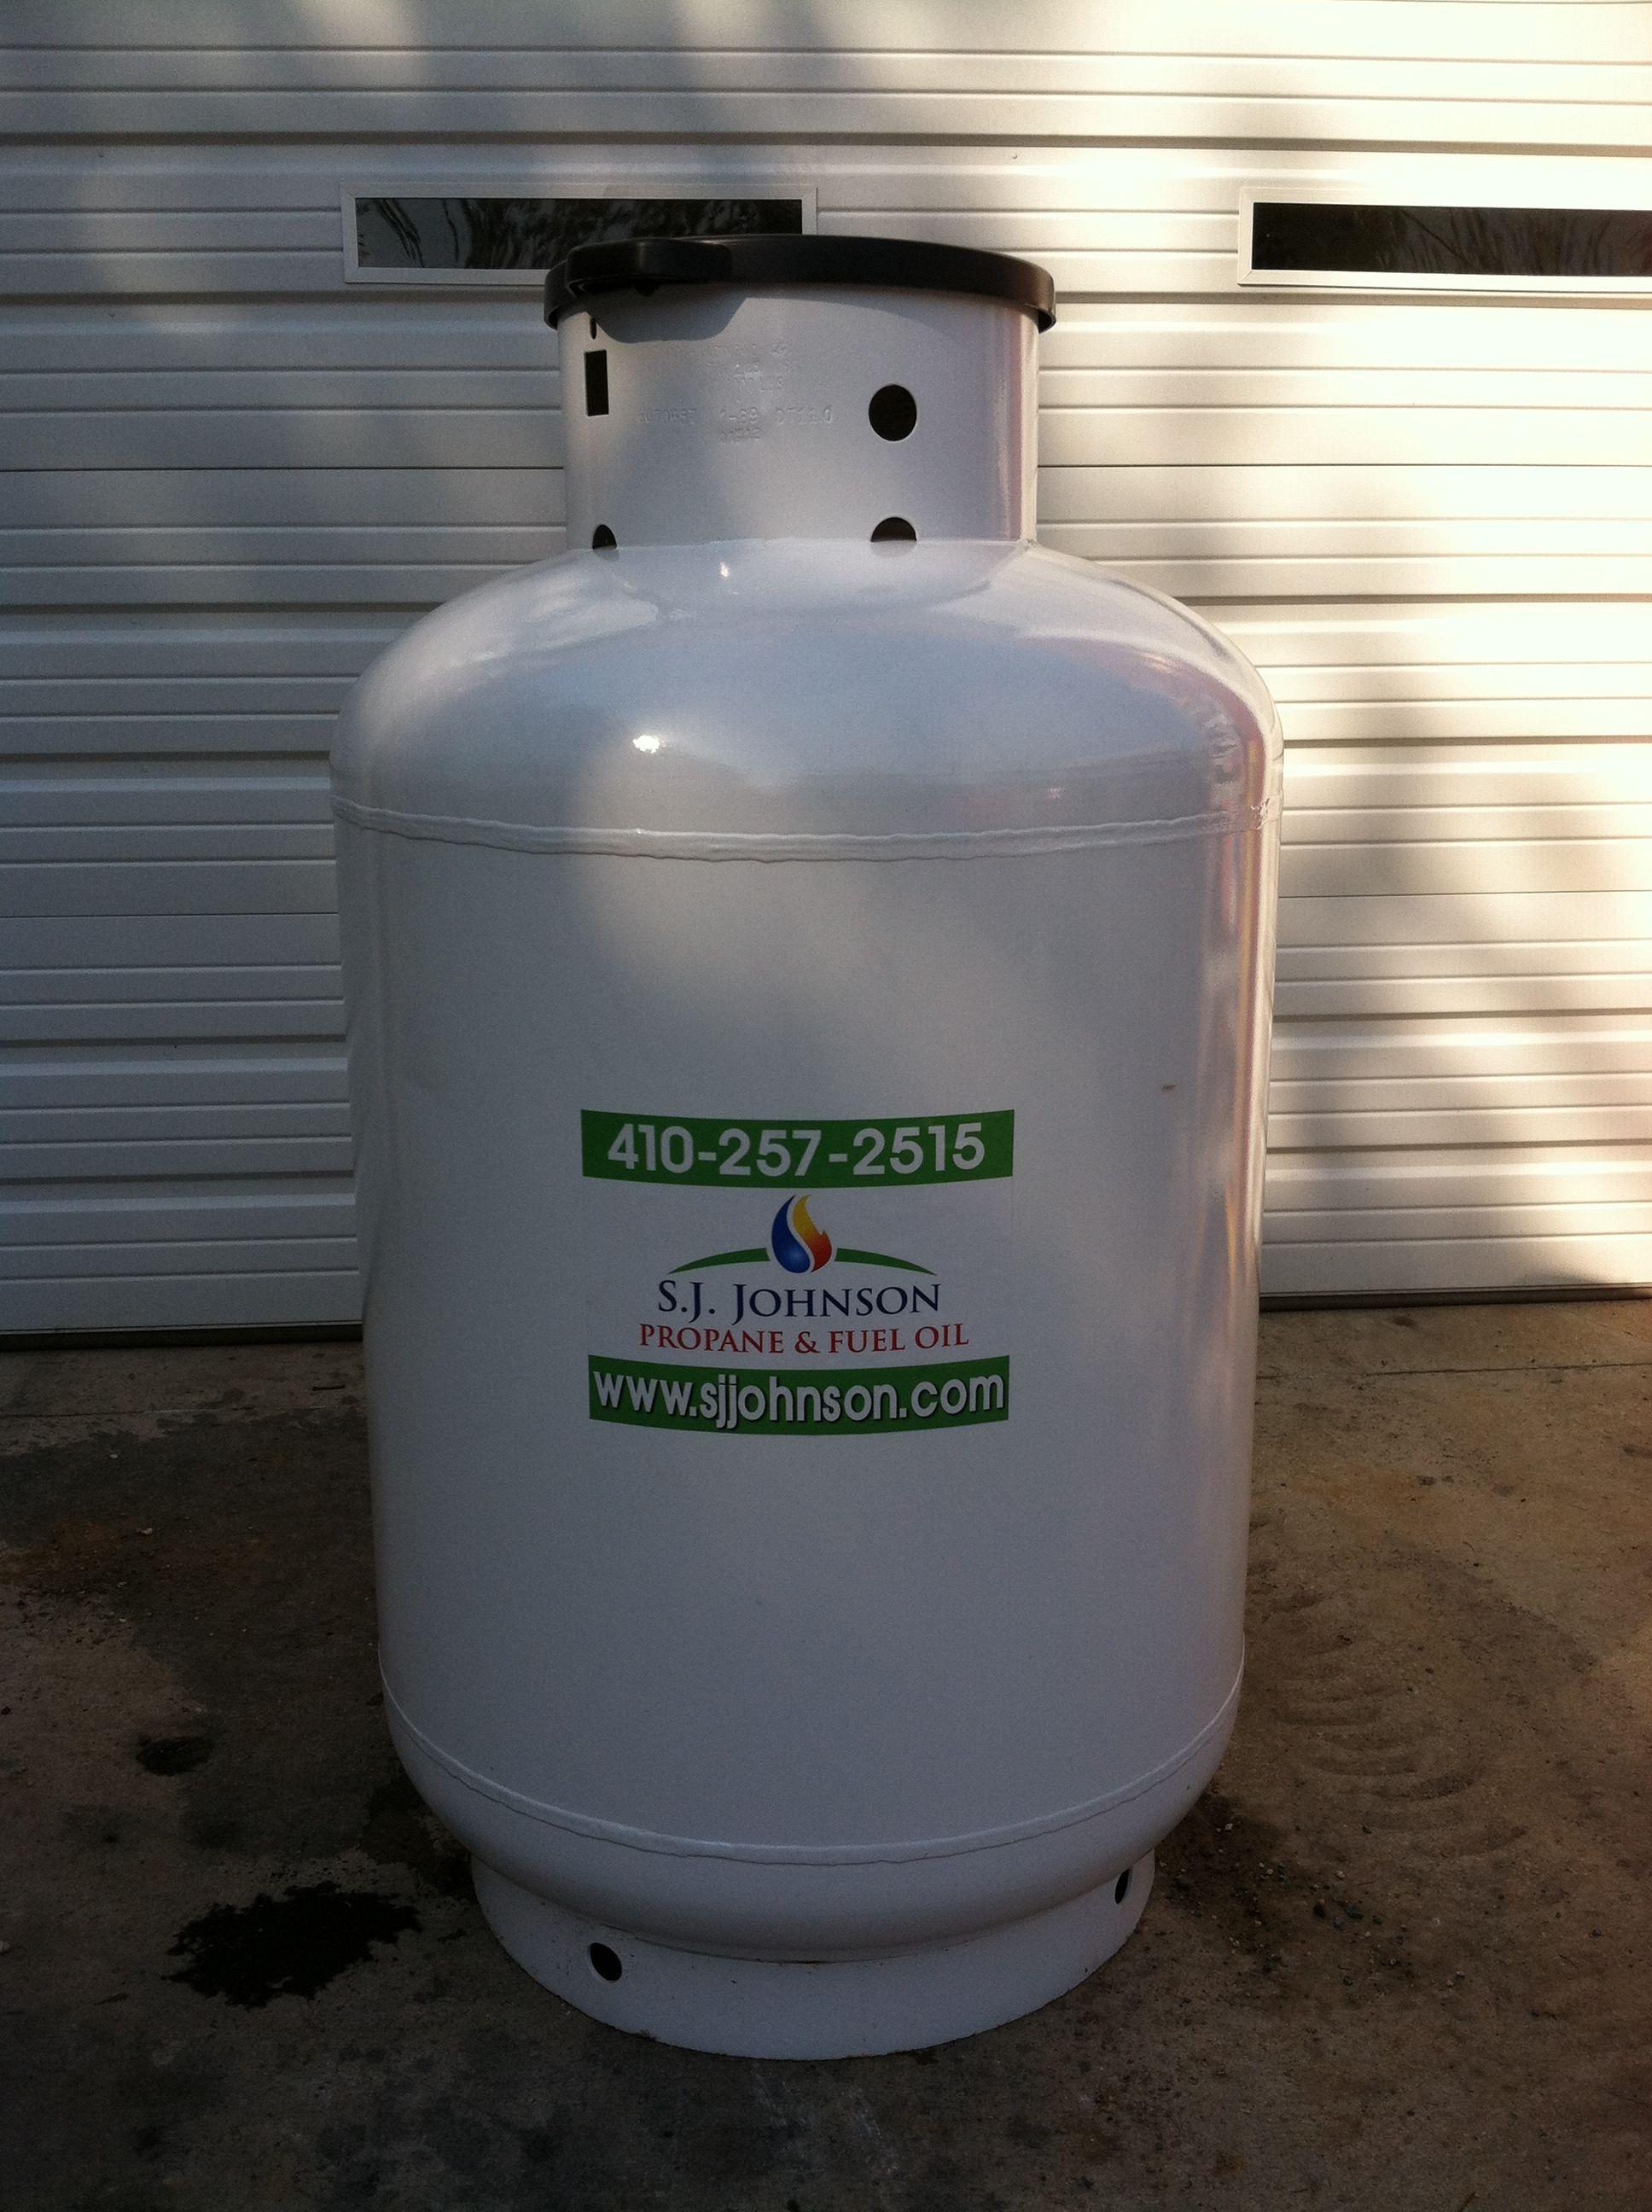 120 Gallon Propane Tank Propane Tank Propane Water Heater